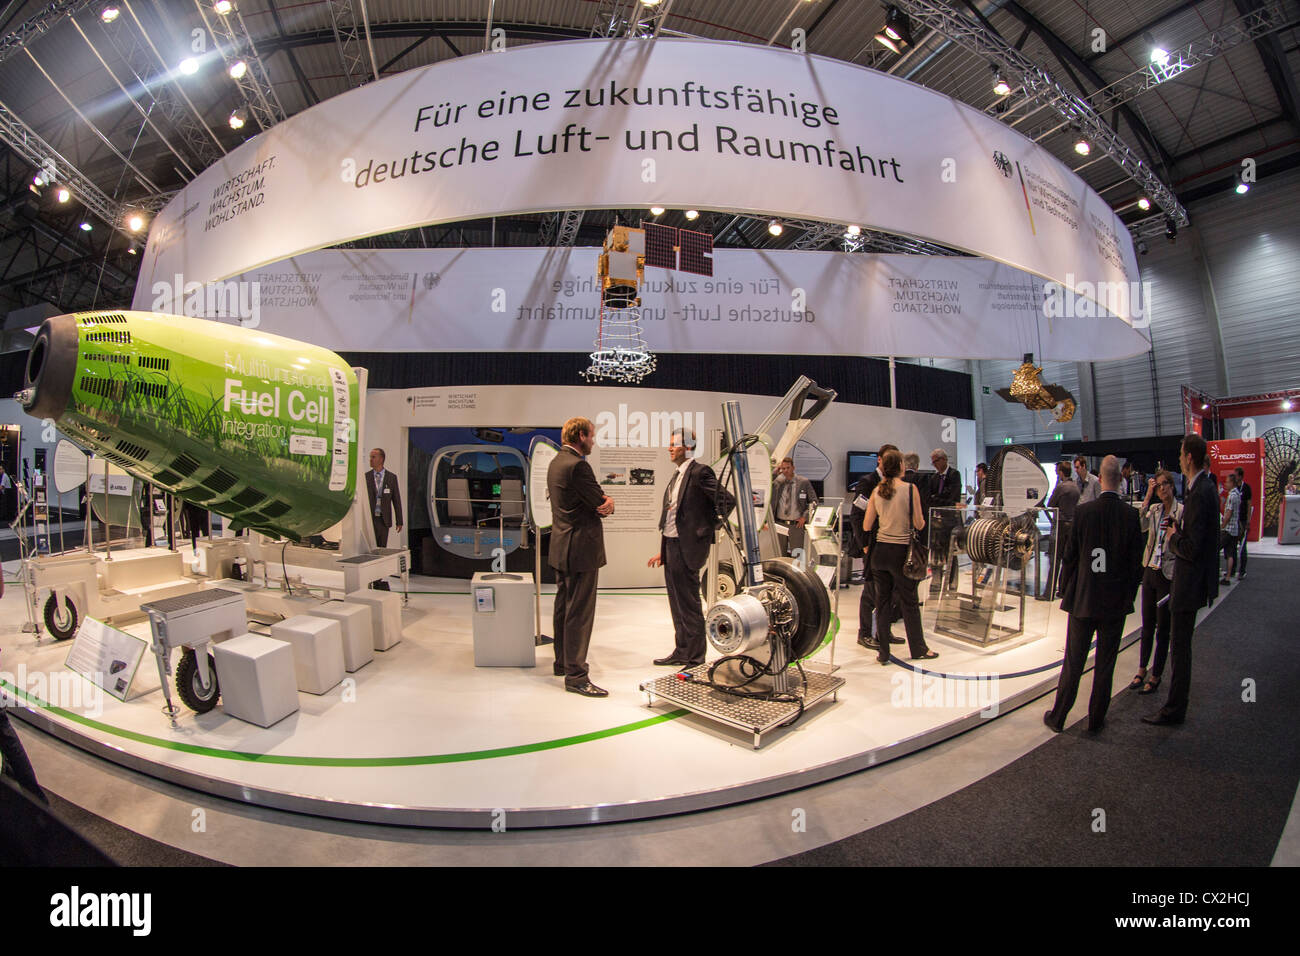 BMWi, Fuel Cell ILA , International Aerospace Exhibition , Berlin - Stock Image